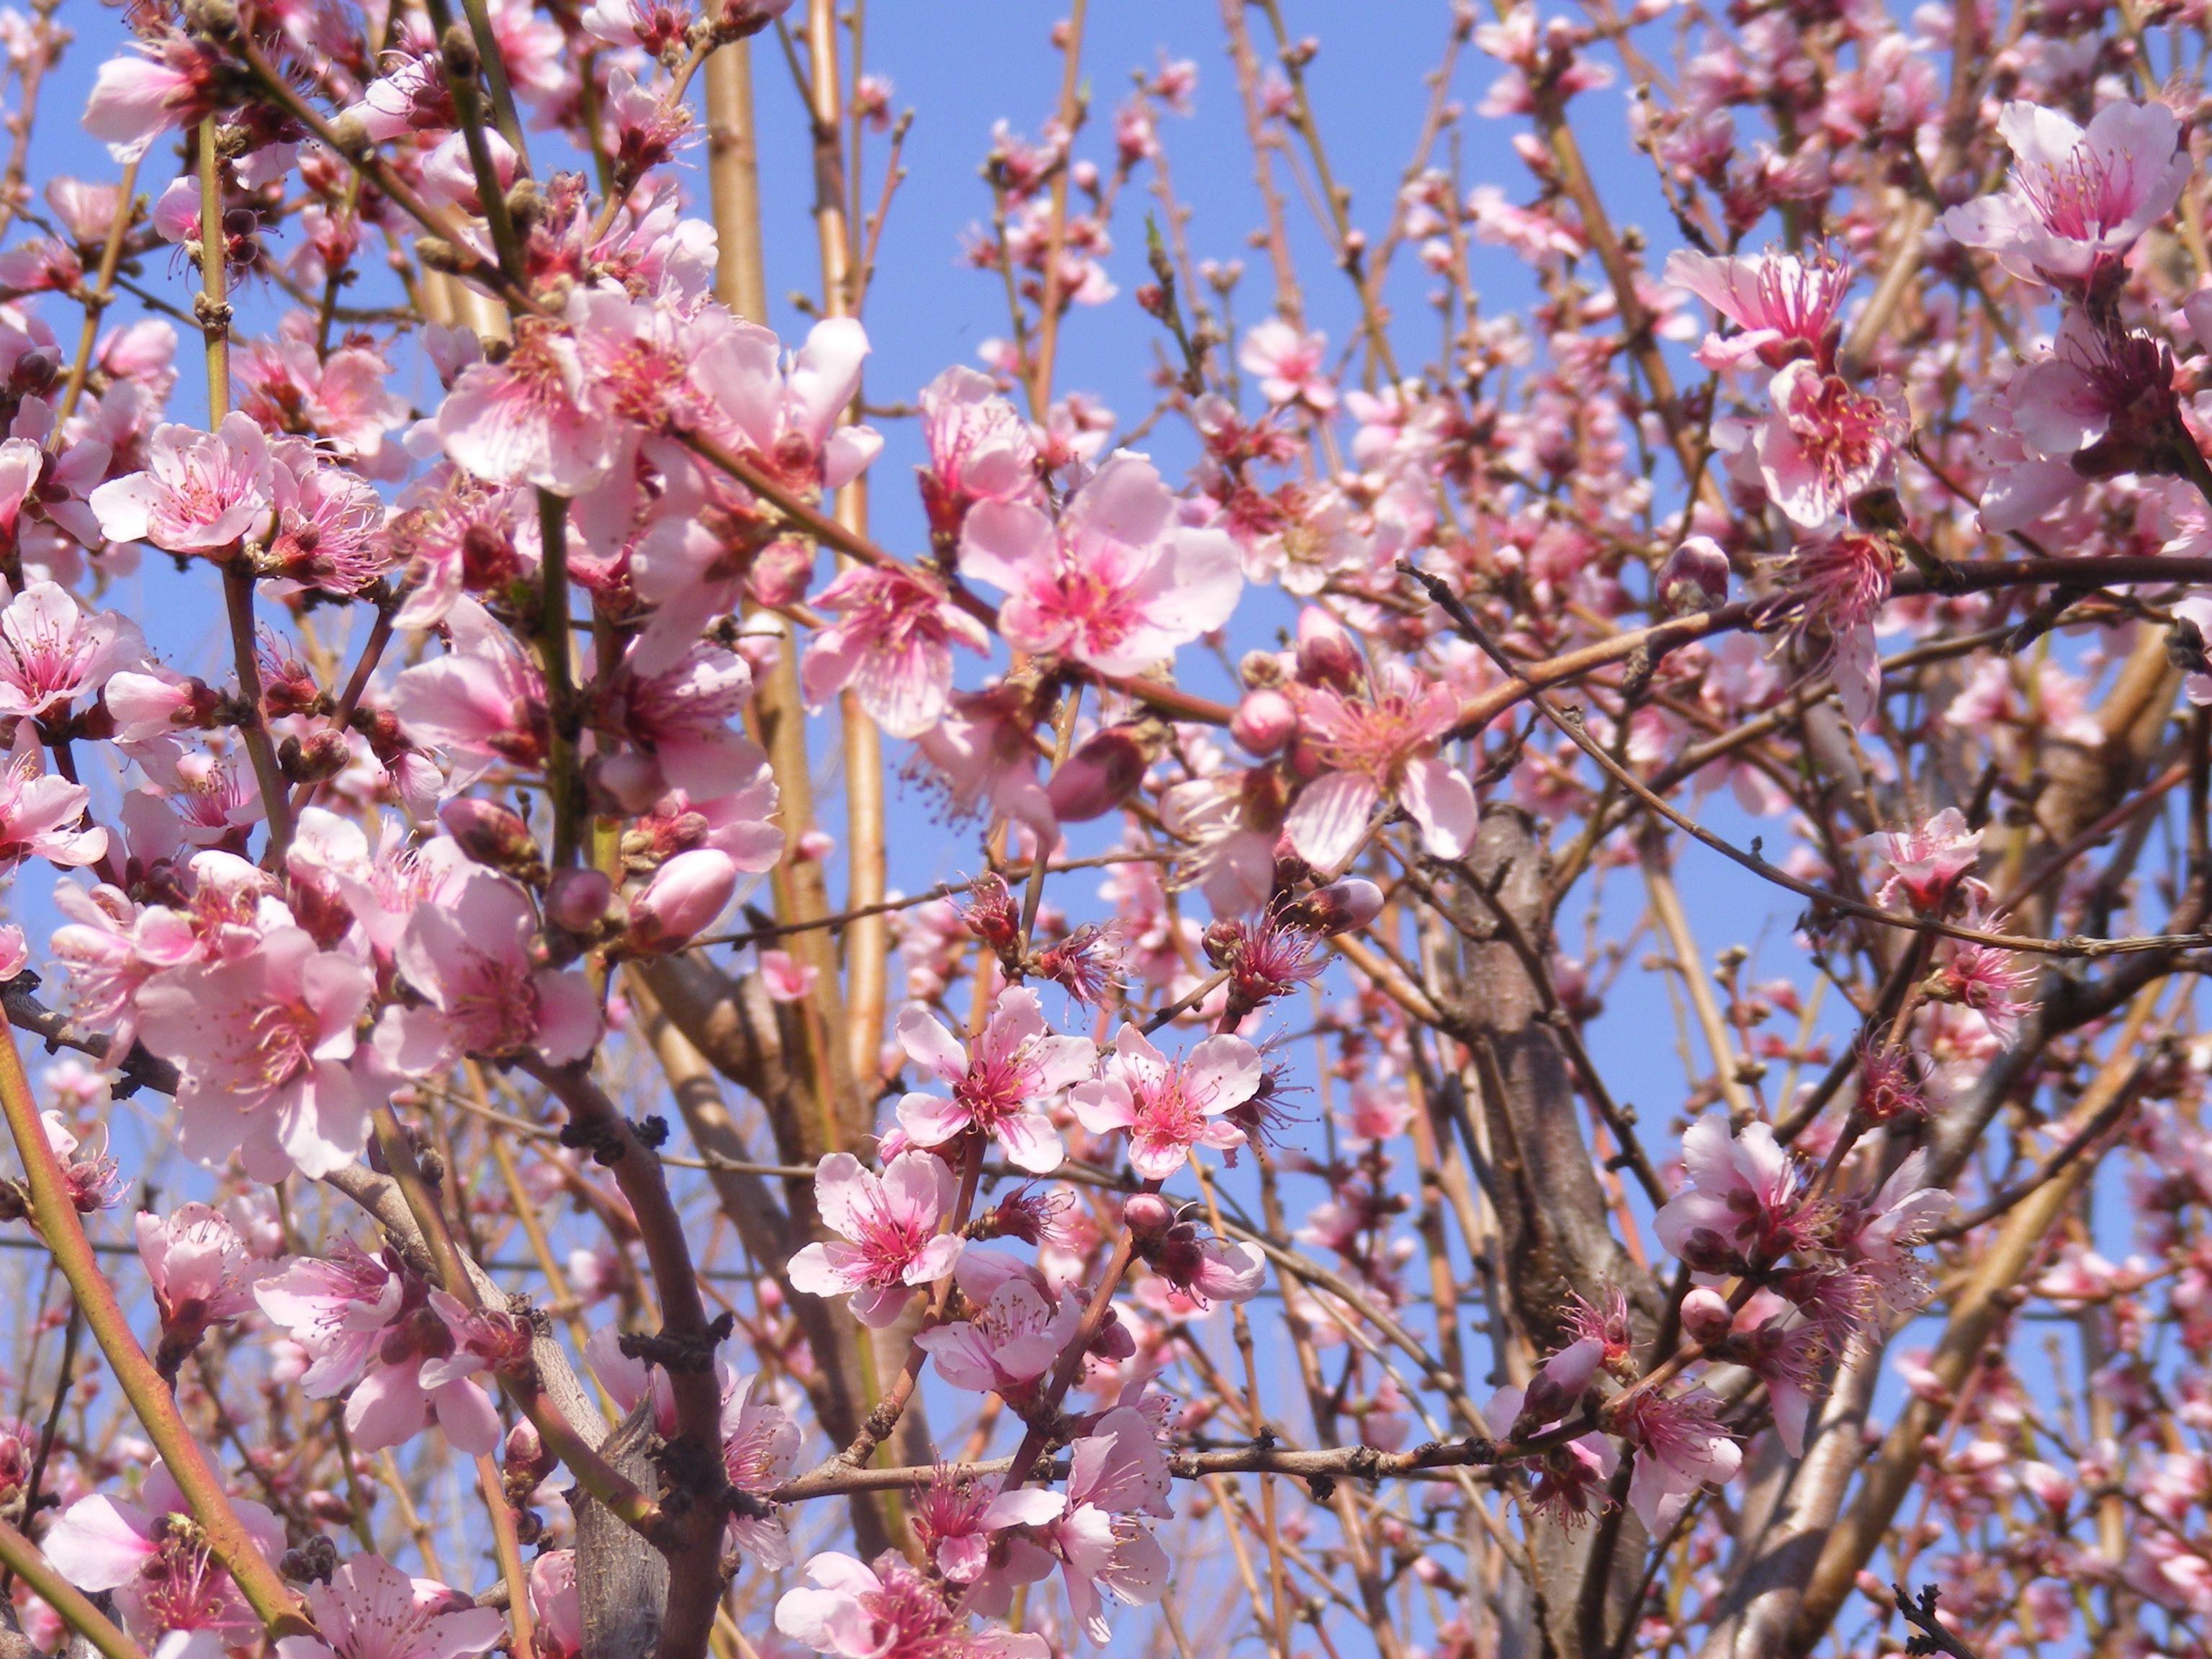 A Peach Tree In Full Blossom Peach Trees Blossom Fruit Trees